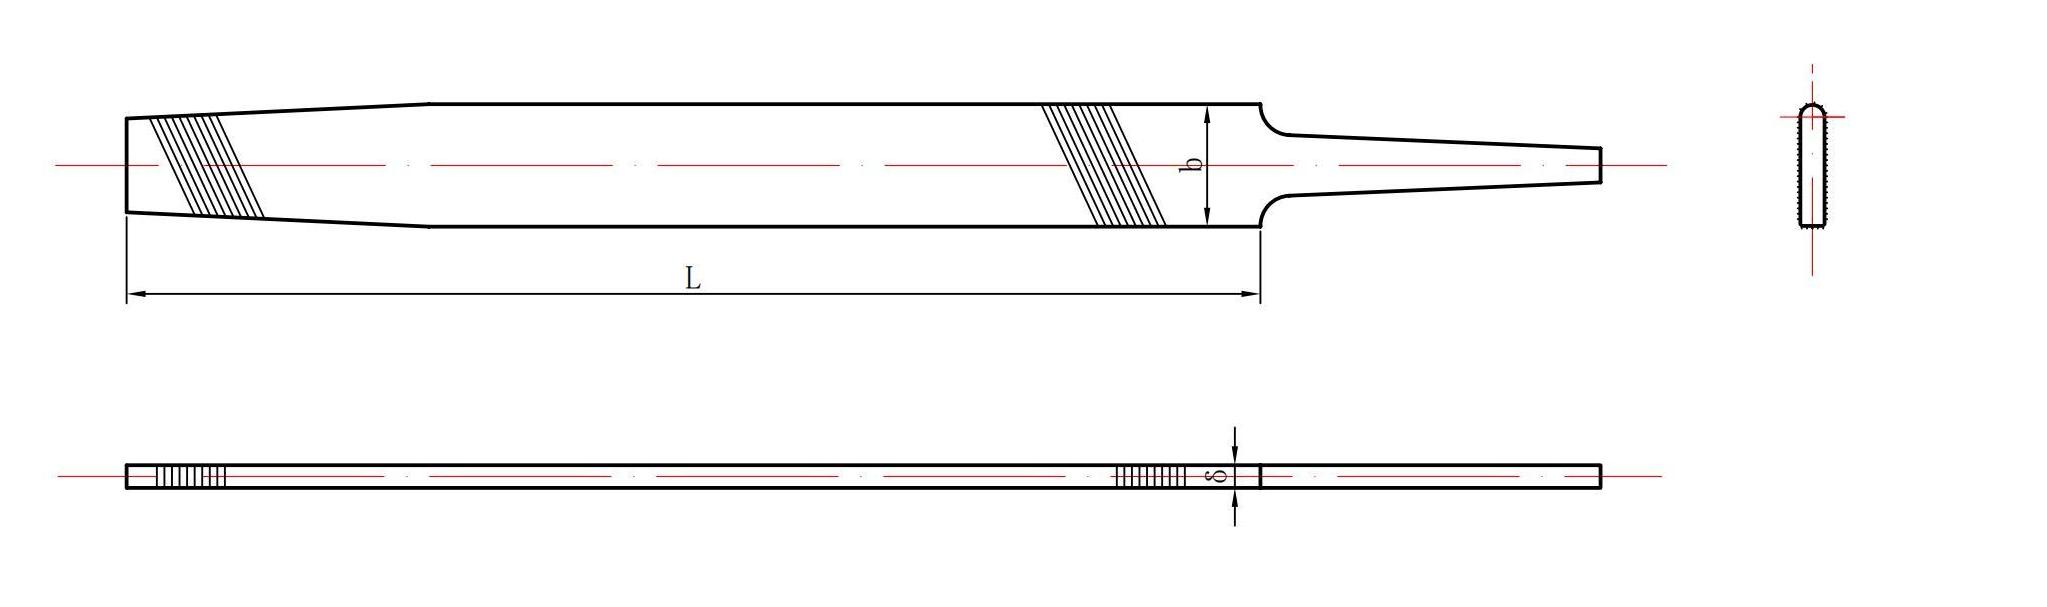 Single arc mill saw file